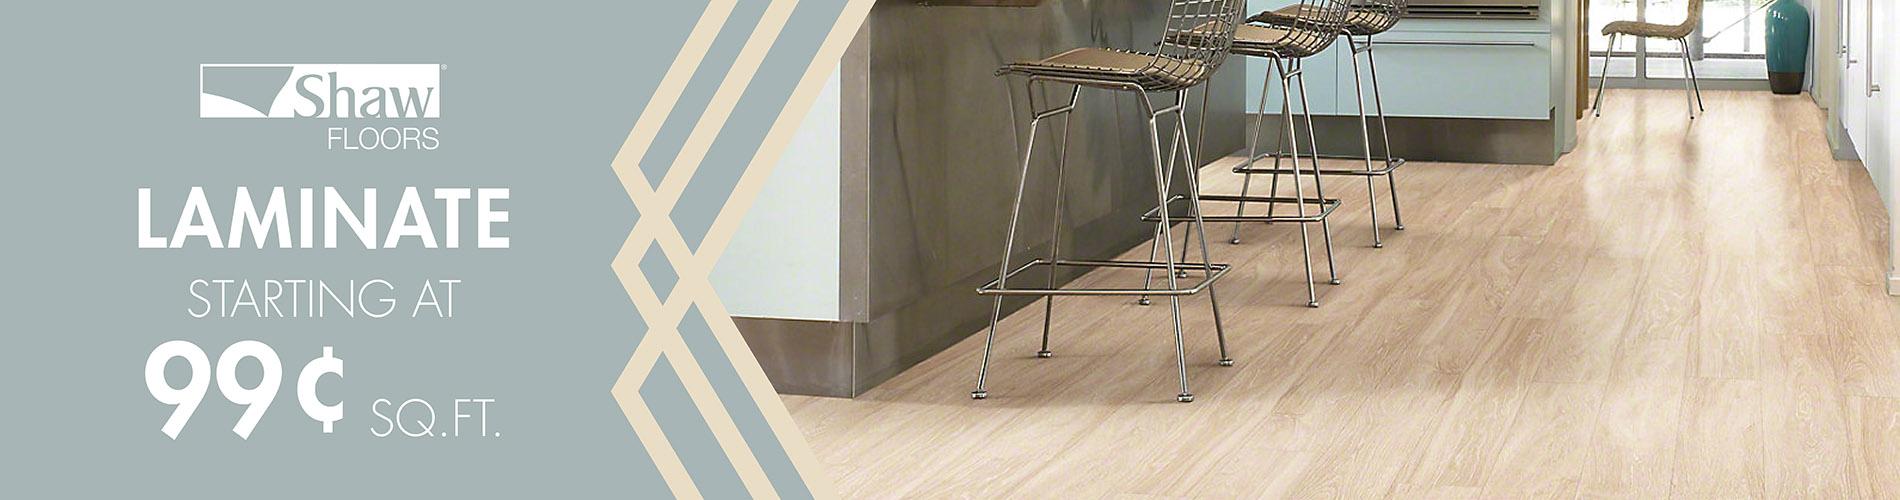 Shaw Floors laminate starting at $.99 sq. ft.